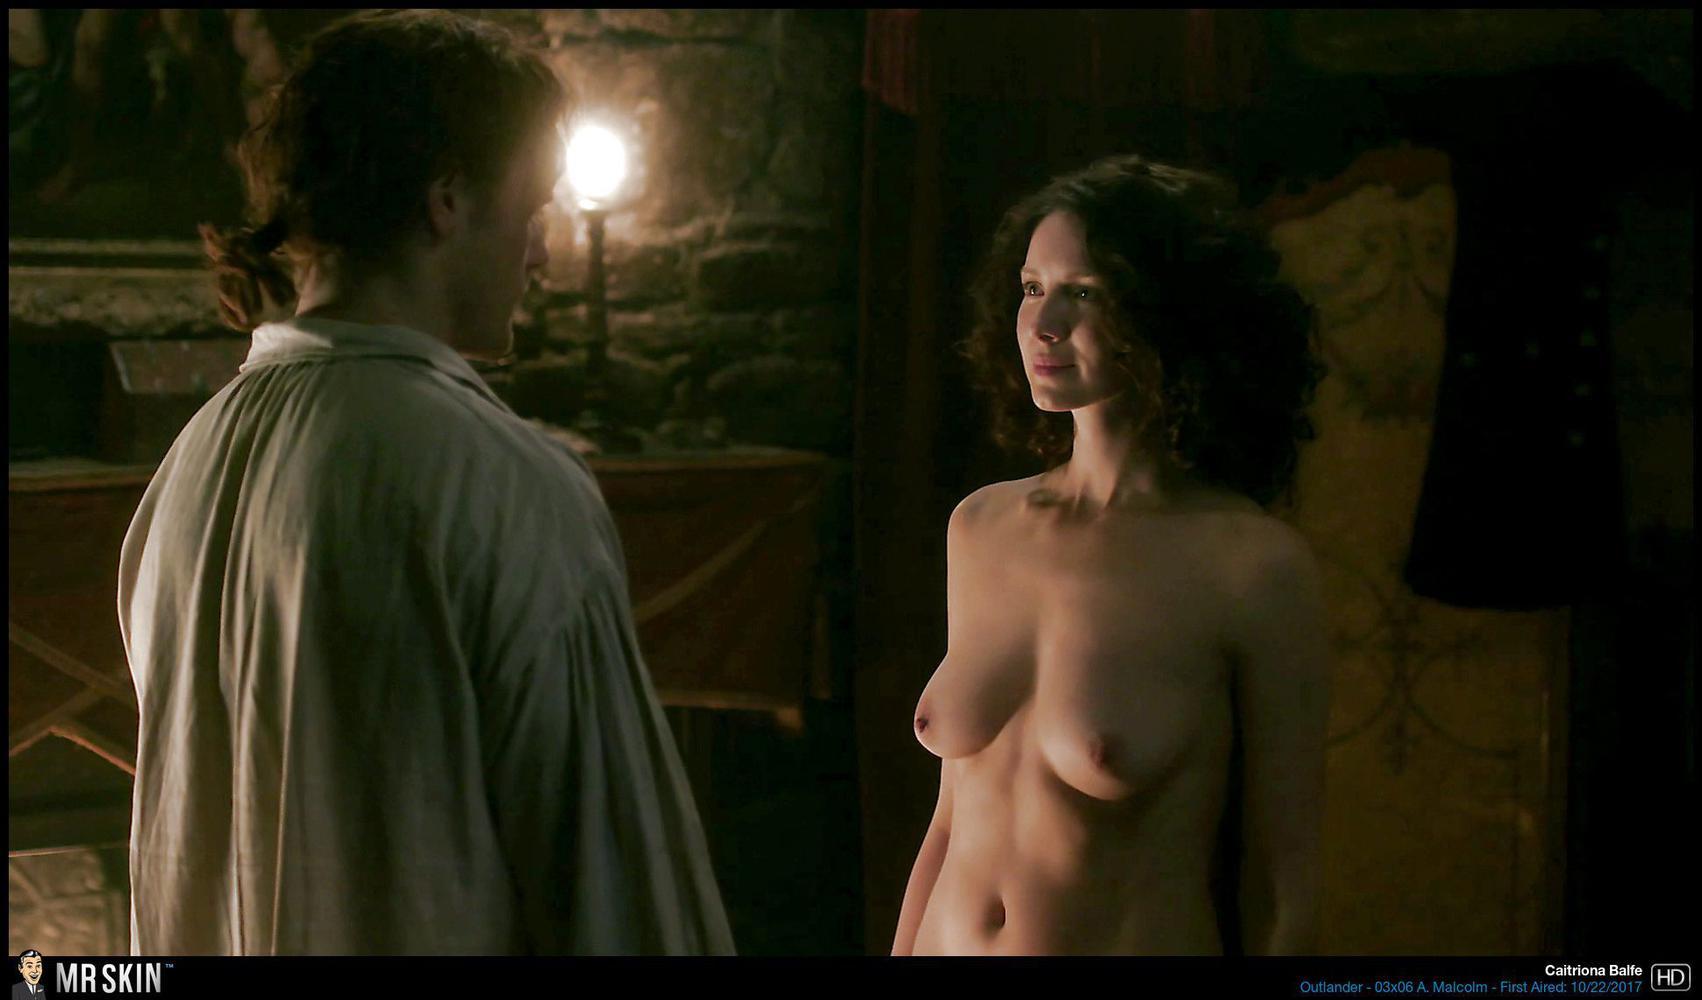 Amy Pietz Nude tv nudity report the deuce, outlander, you're the worst, rellik,